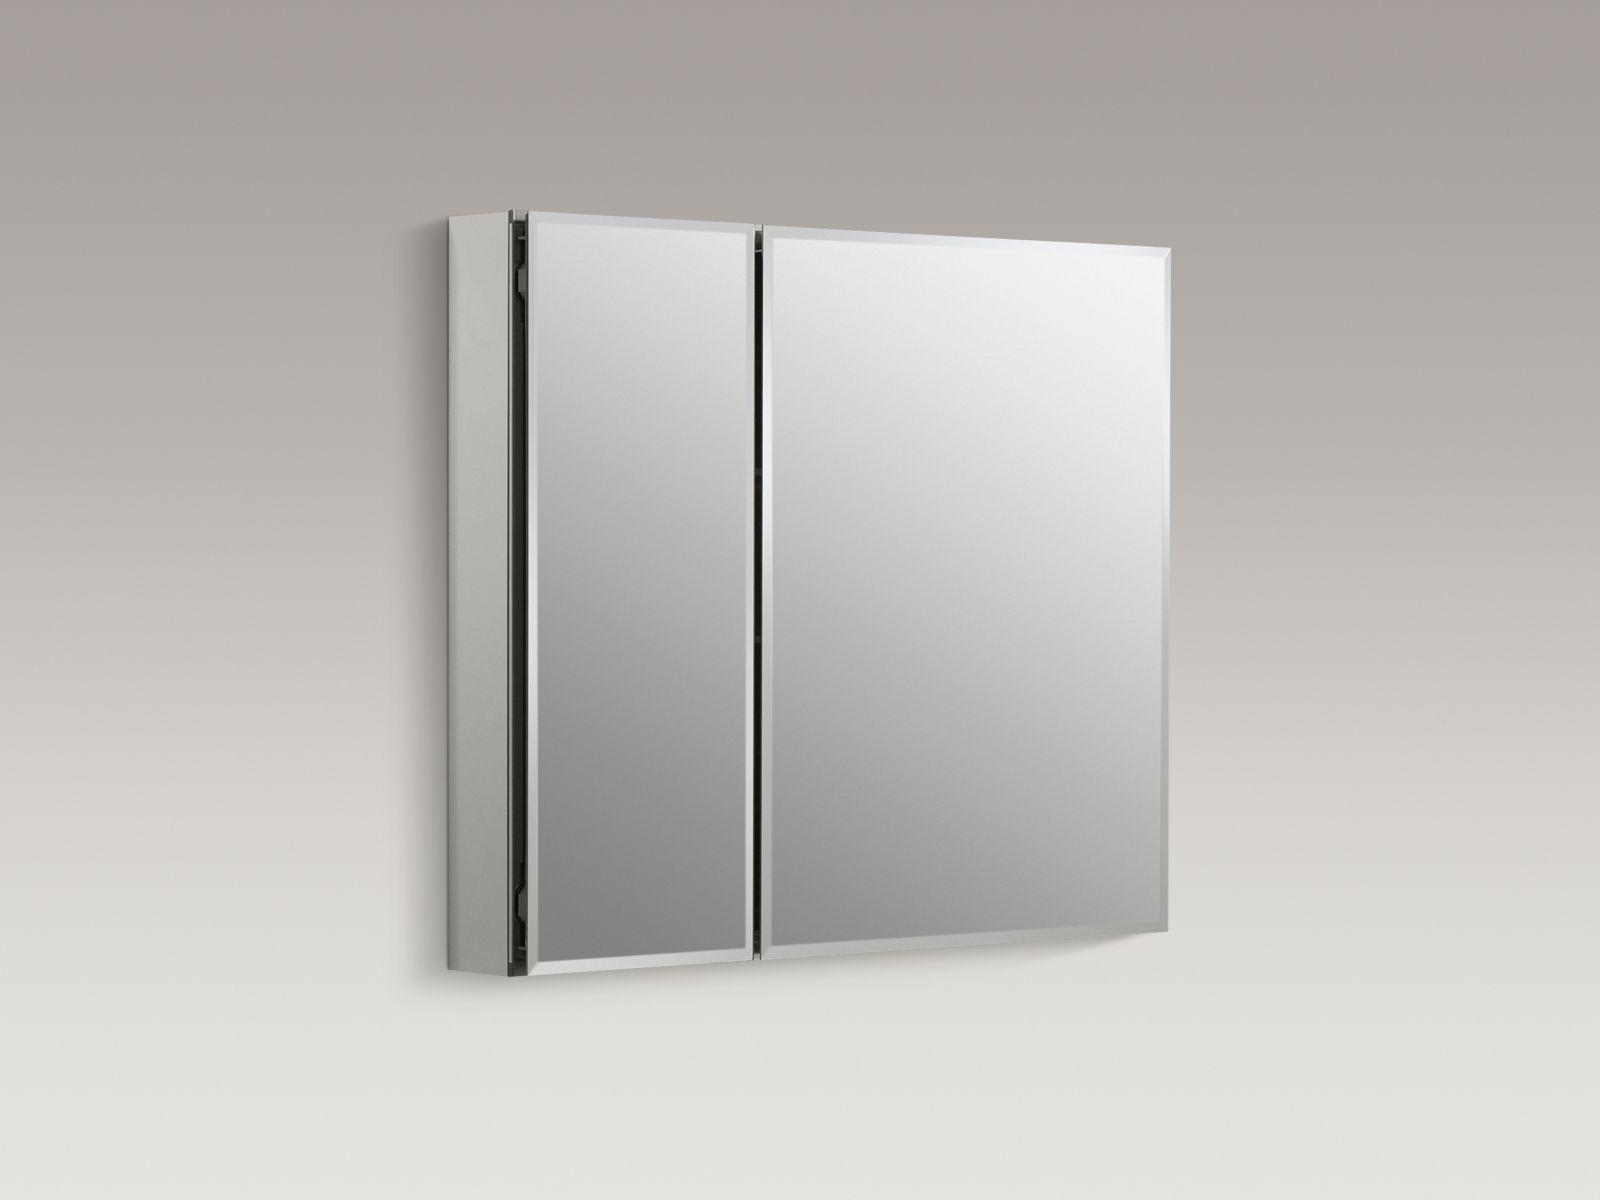 "Kohler K-CB-CLC3026FS Aluminum 30"" x 26"" Two-door Medicine Cabinet with Square Mirrored Doors"